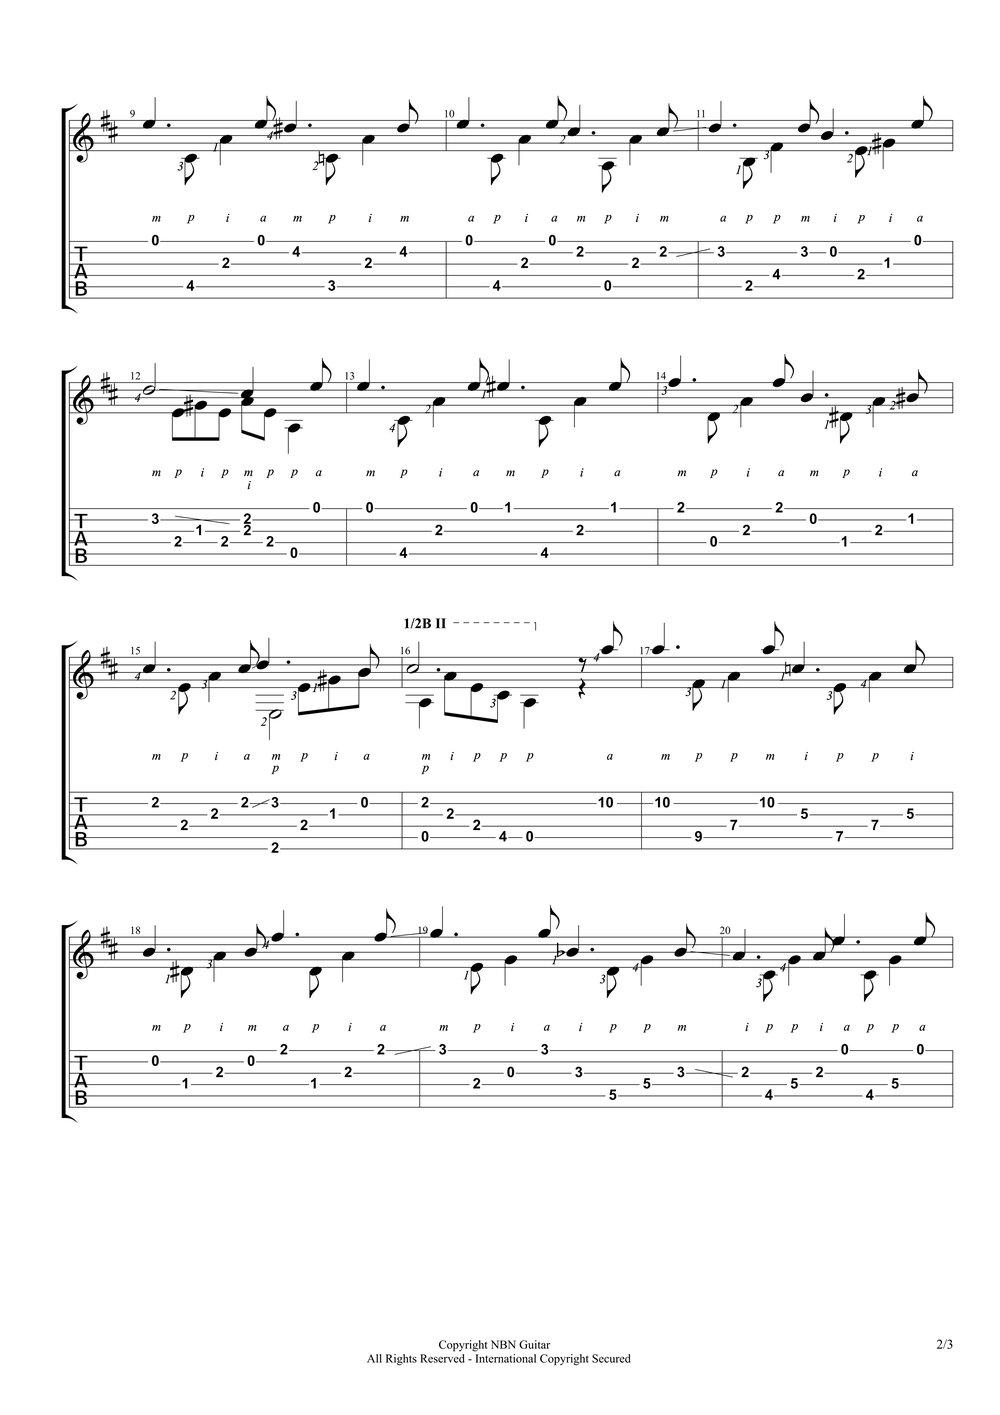 Study in D (Sheet Music & Tabs)-p3.jpg